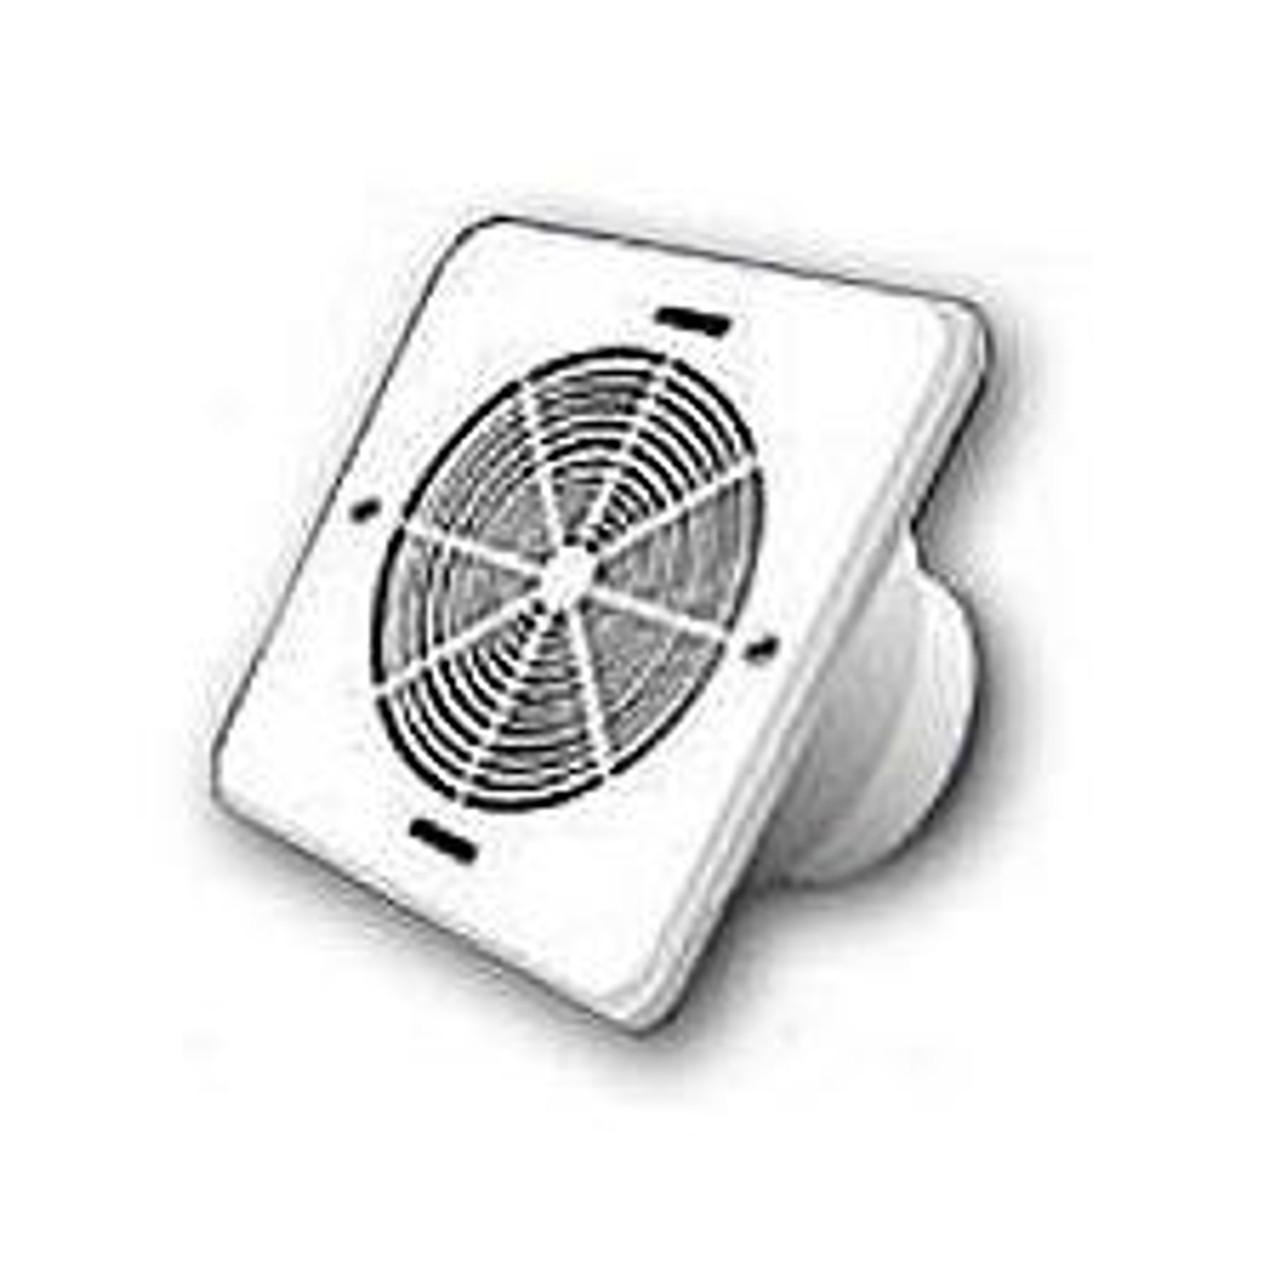 White Vinyl Bathroom Soffit Exhaust Vent Price Per Piece Item 646015 Ventmyhouse Com